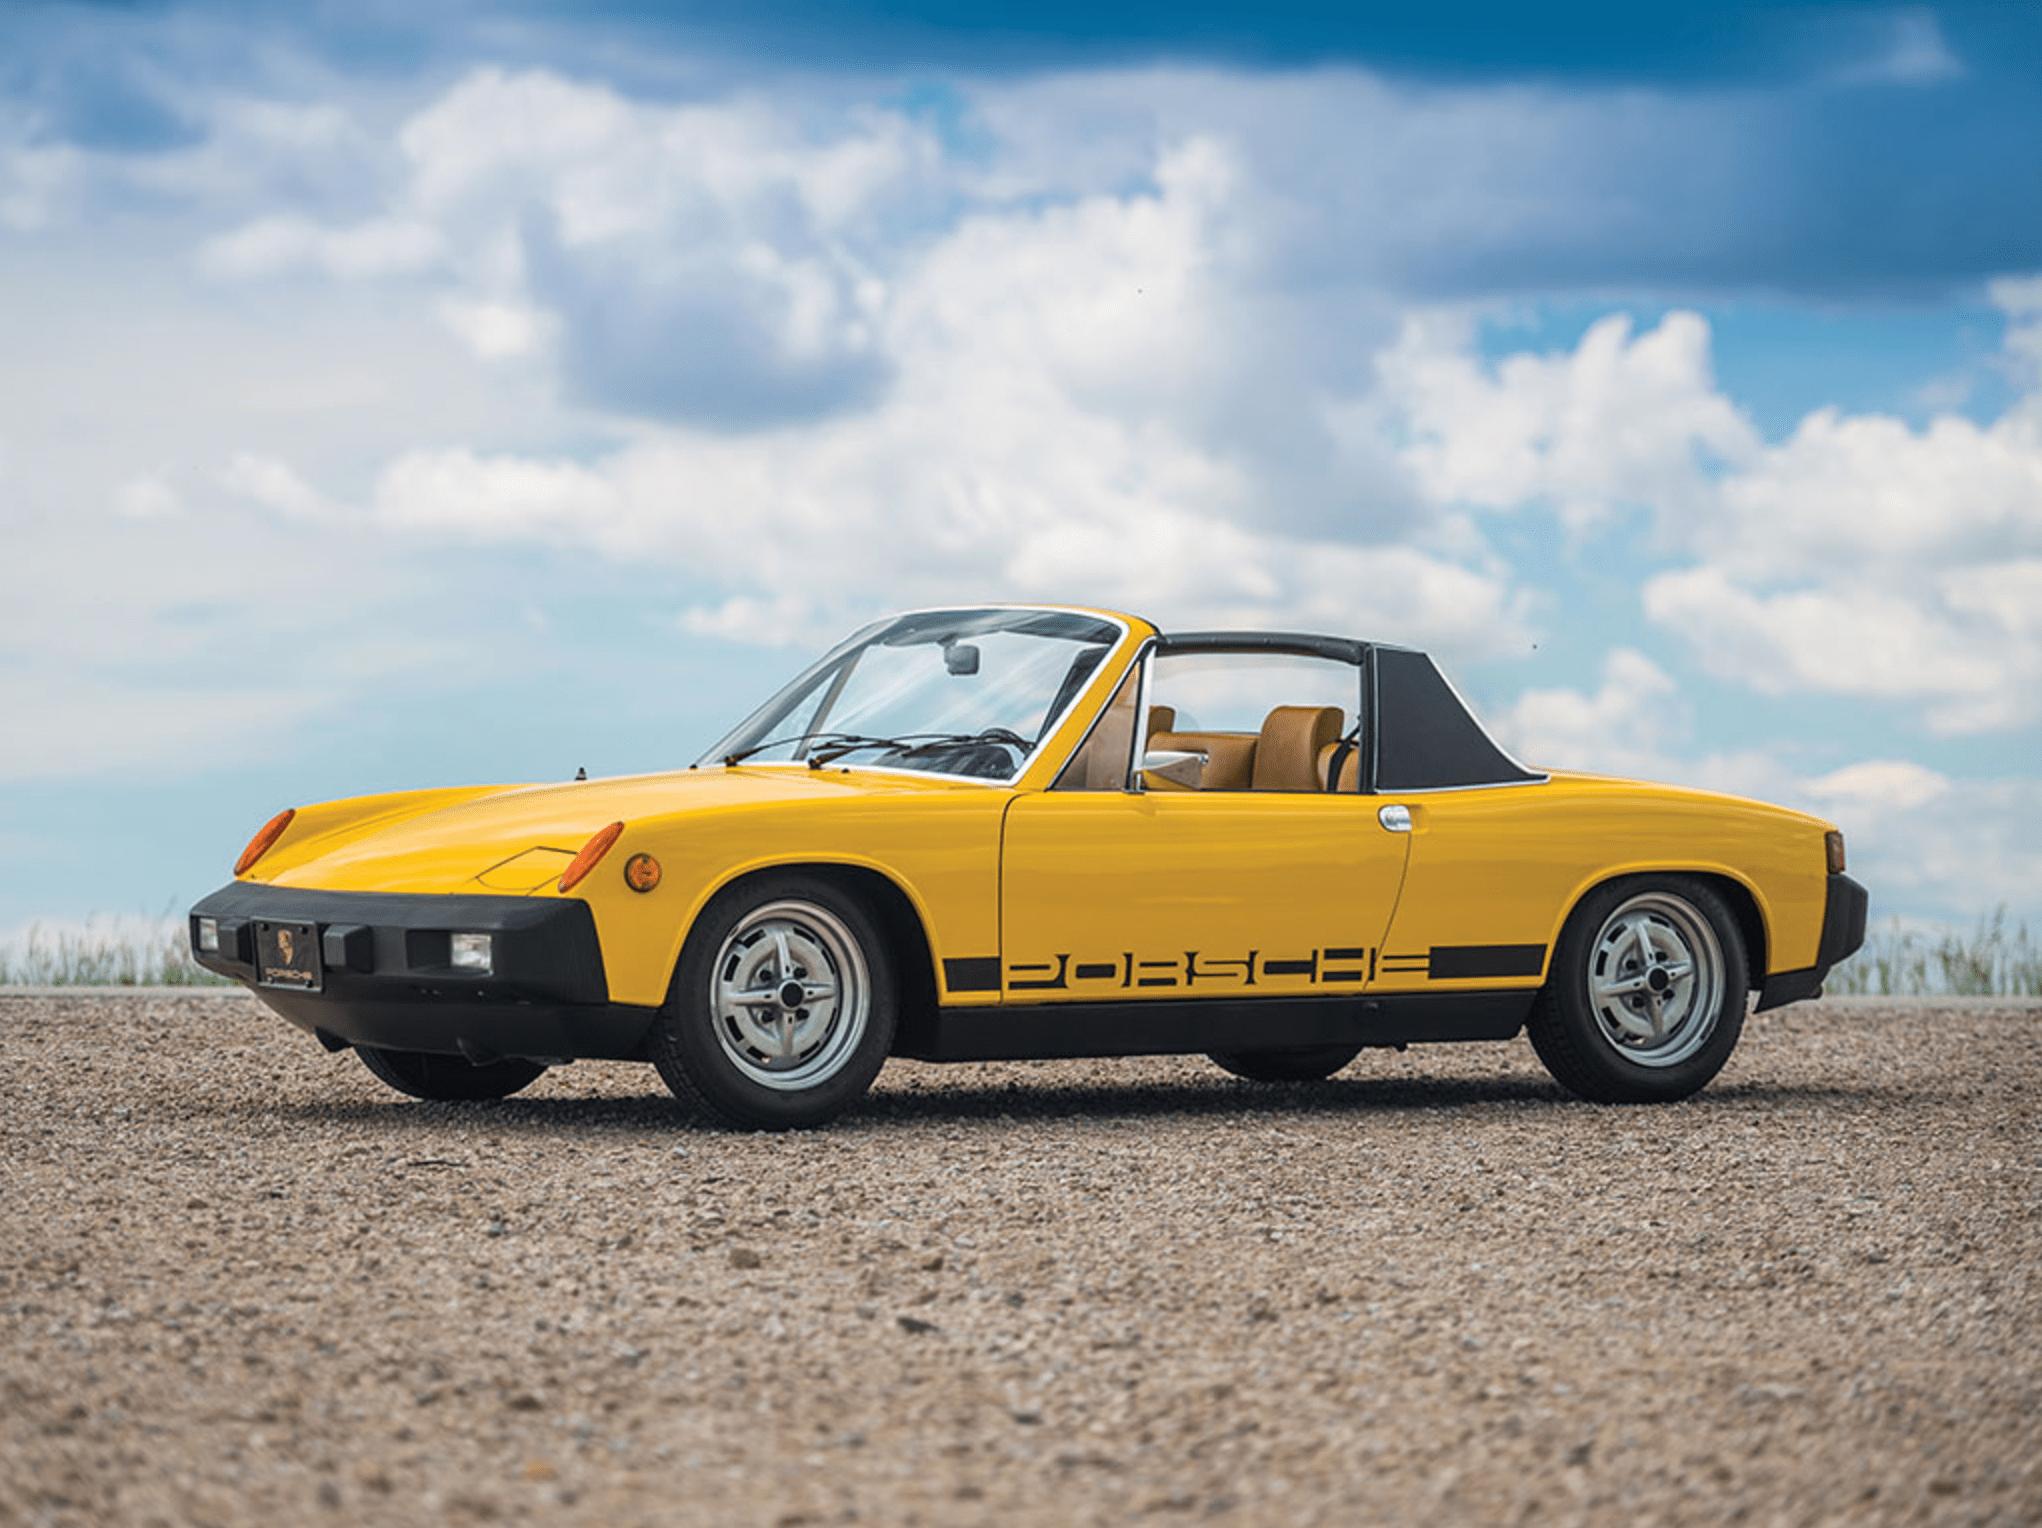 Mclaren Price 2017 >> Model Masterpiece: Porsche 914 | Premier Financial Services